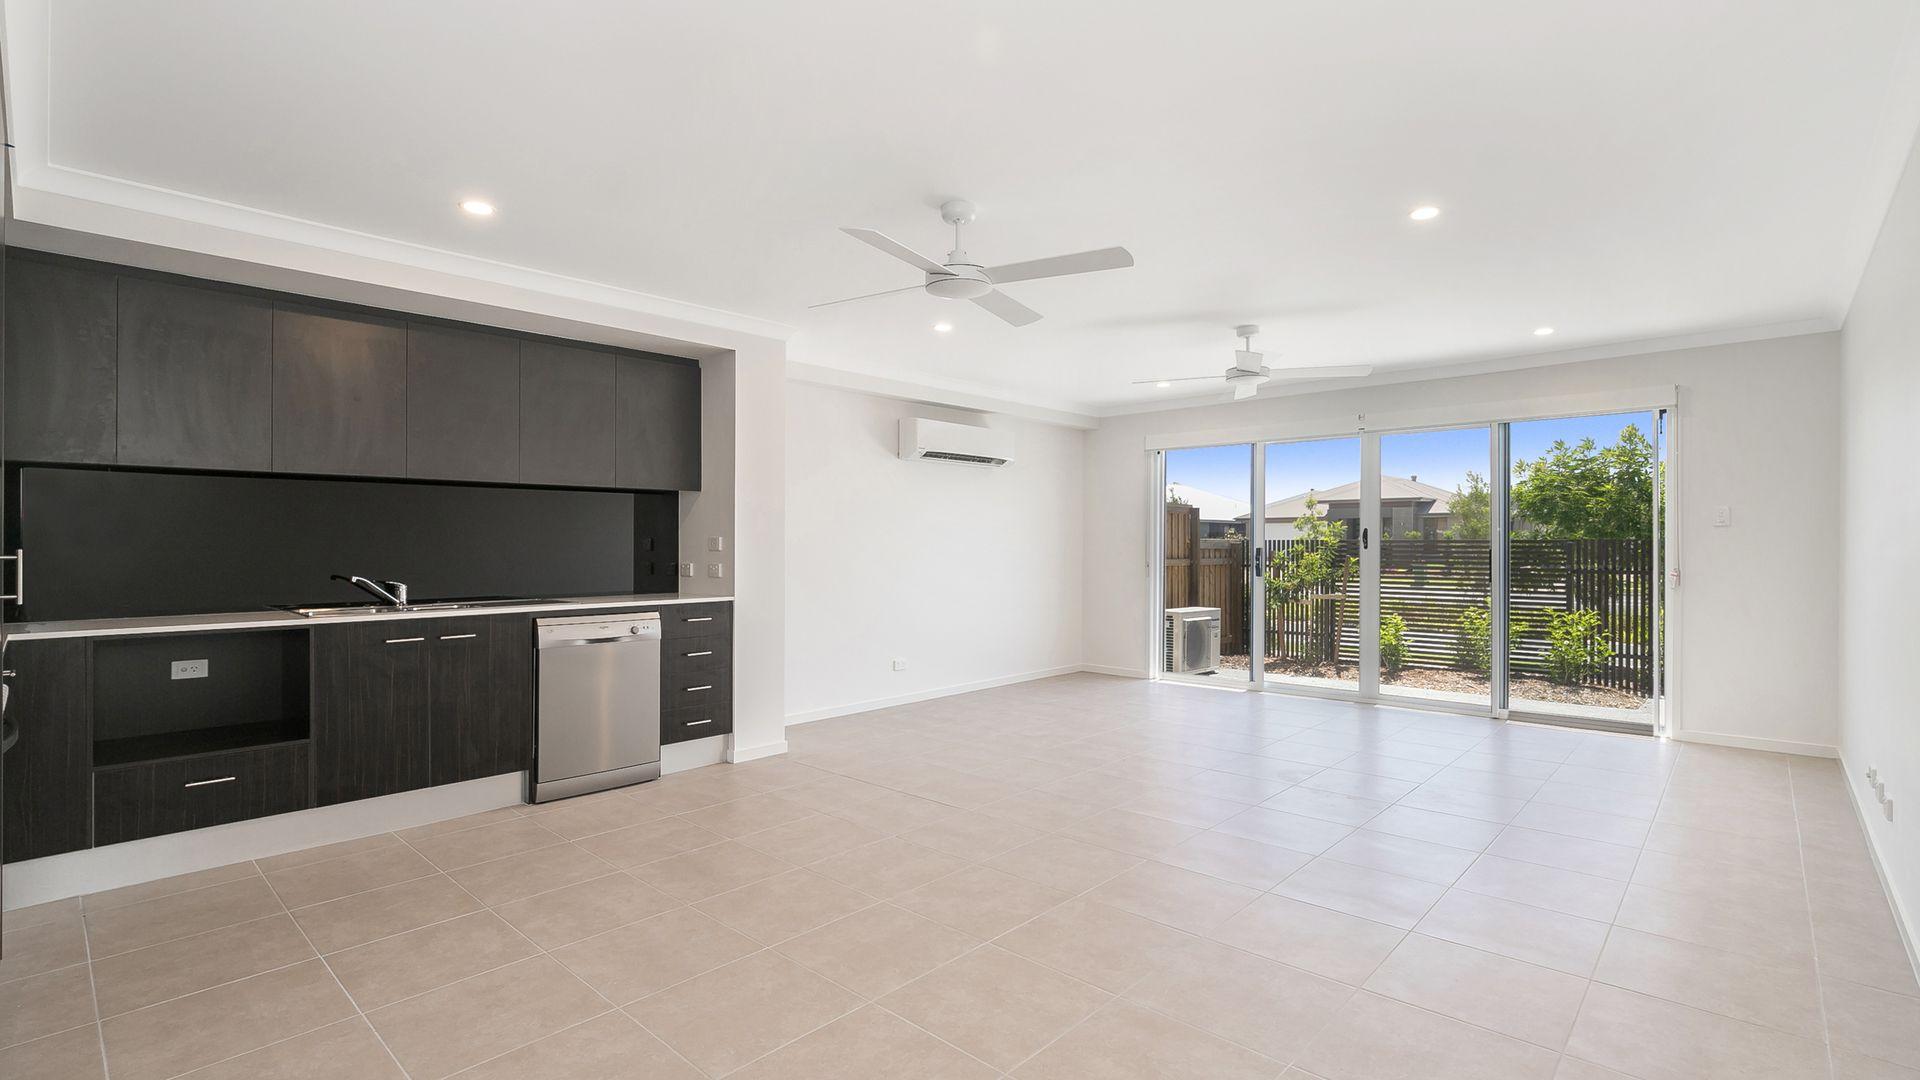 370 Gainsborough Drive, Pimpama QLD 4209, Image 1